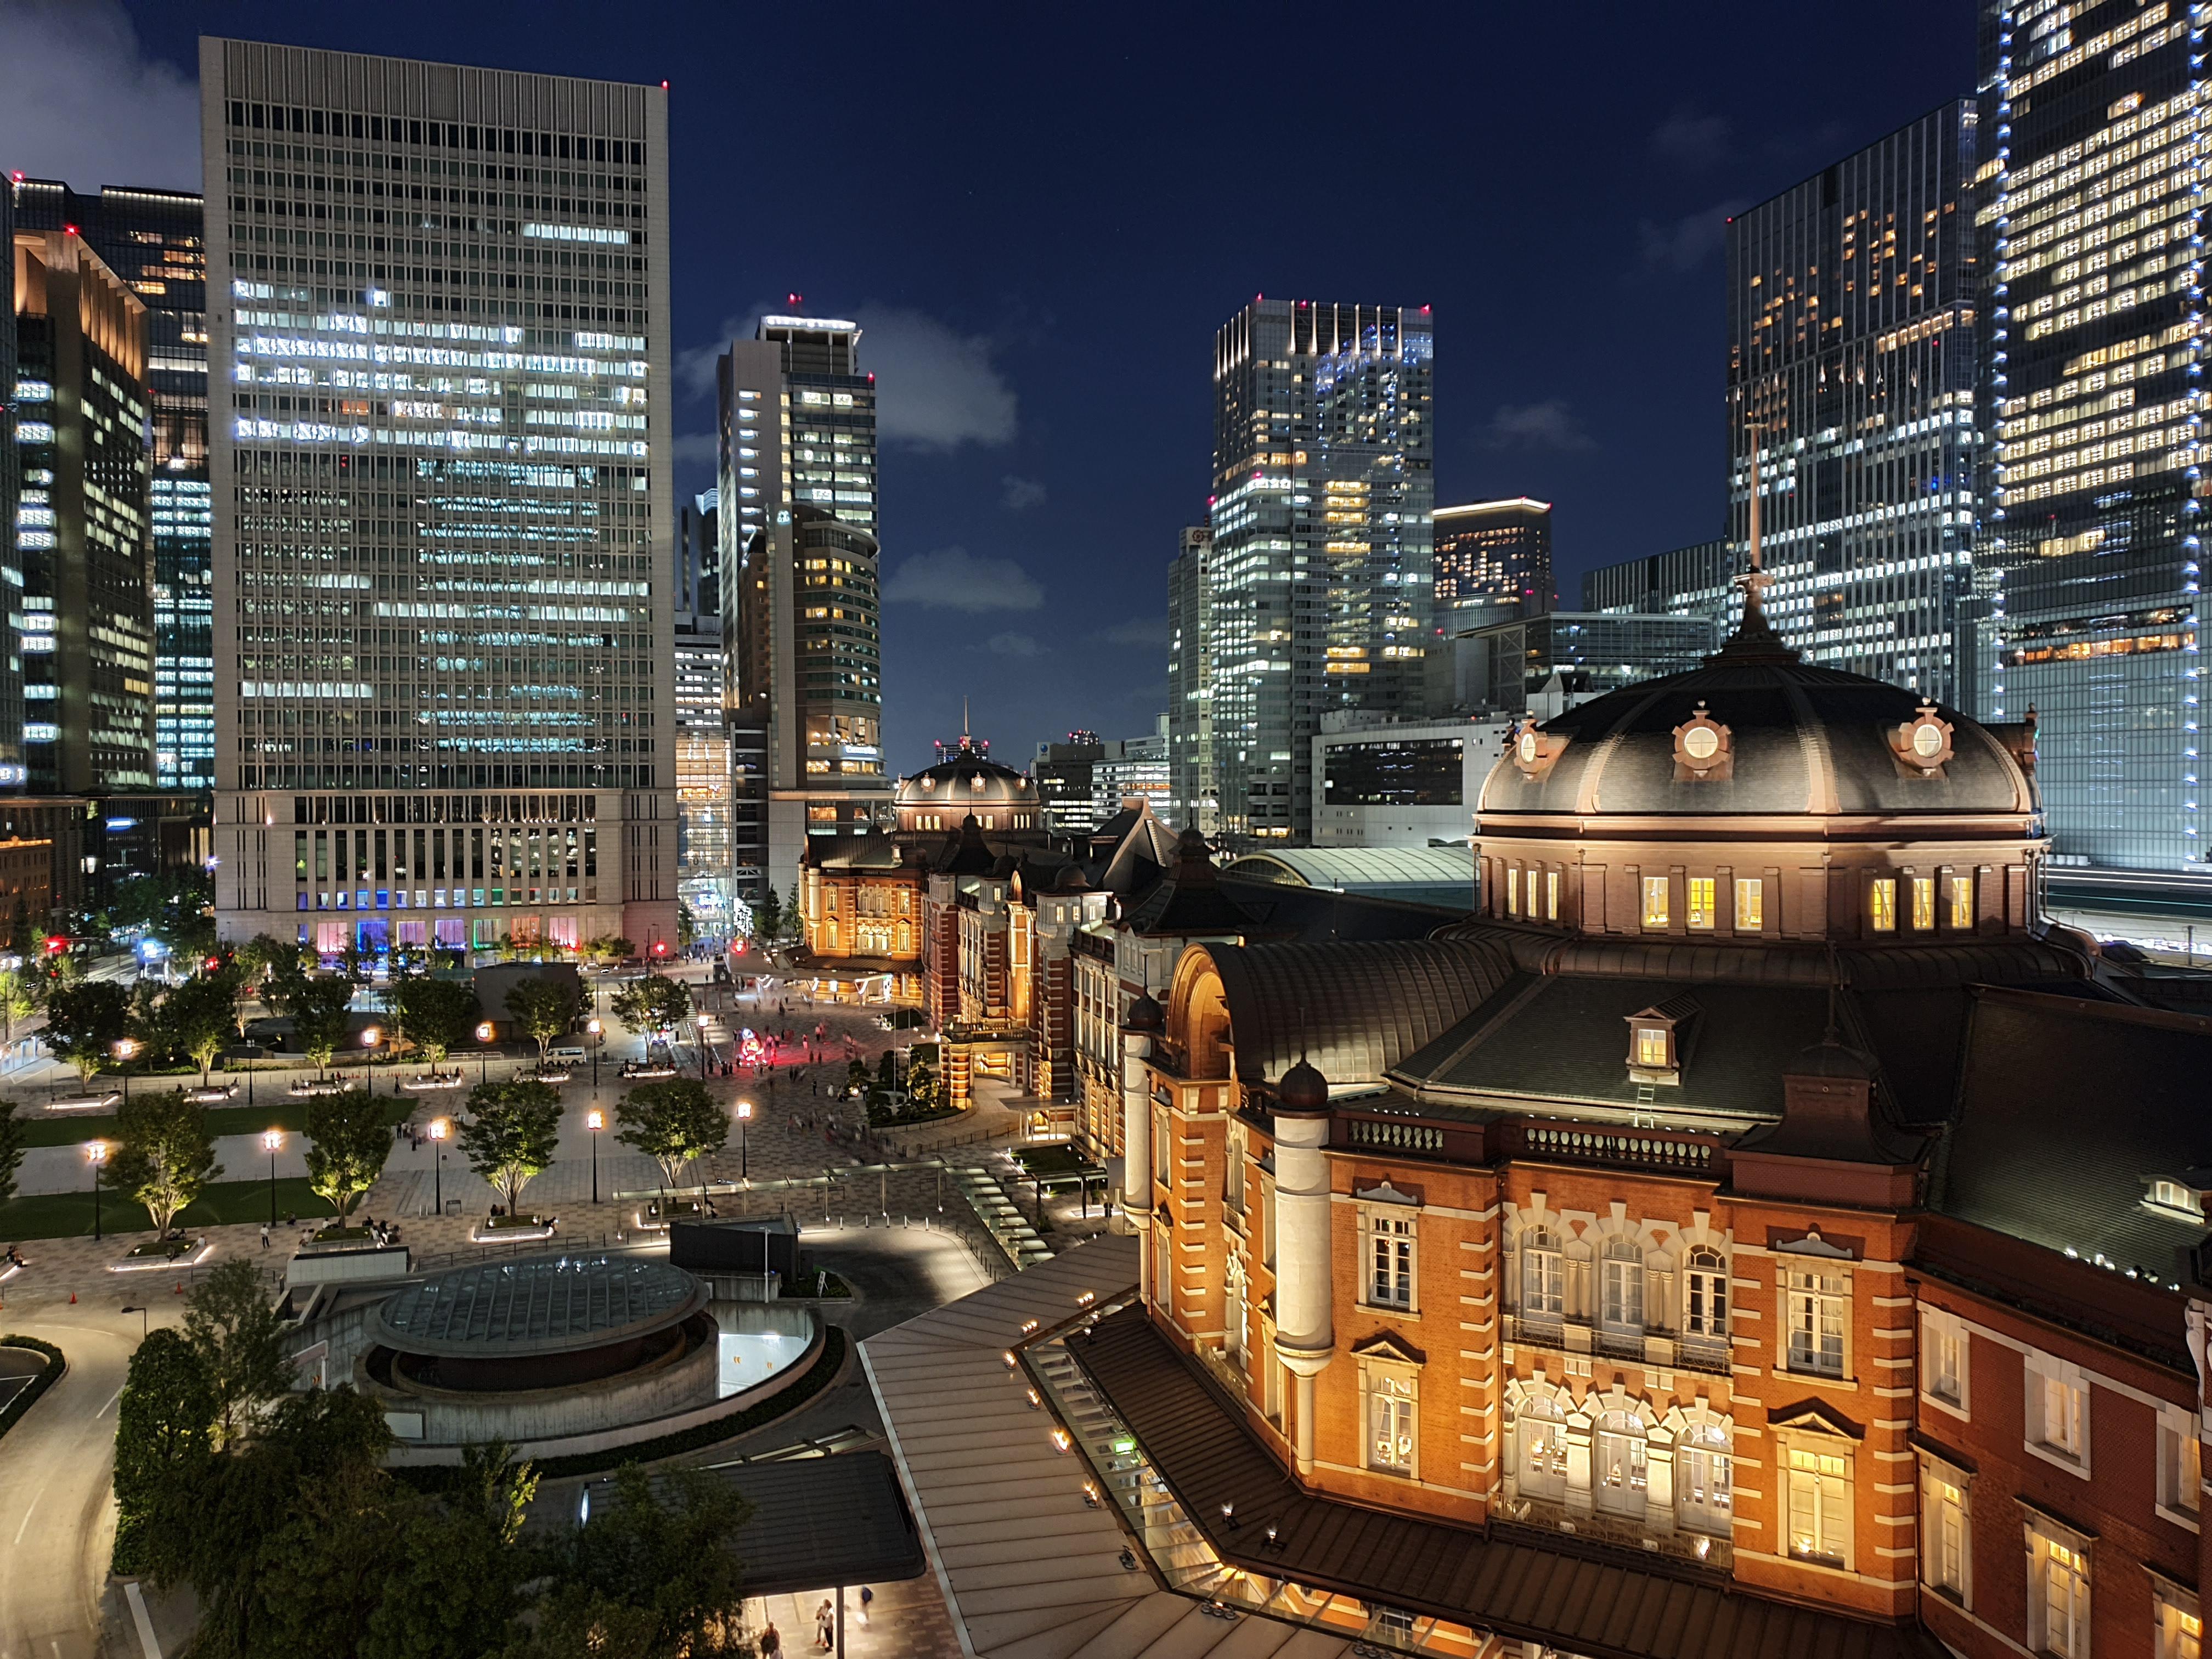 DxOMark上位ランクインのスマートフォンによるカメラ性能比較、JR東京駅を撮影